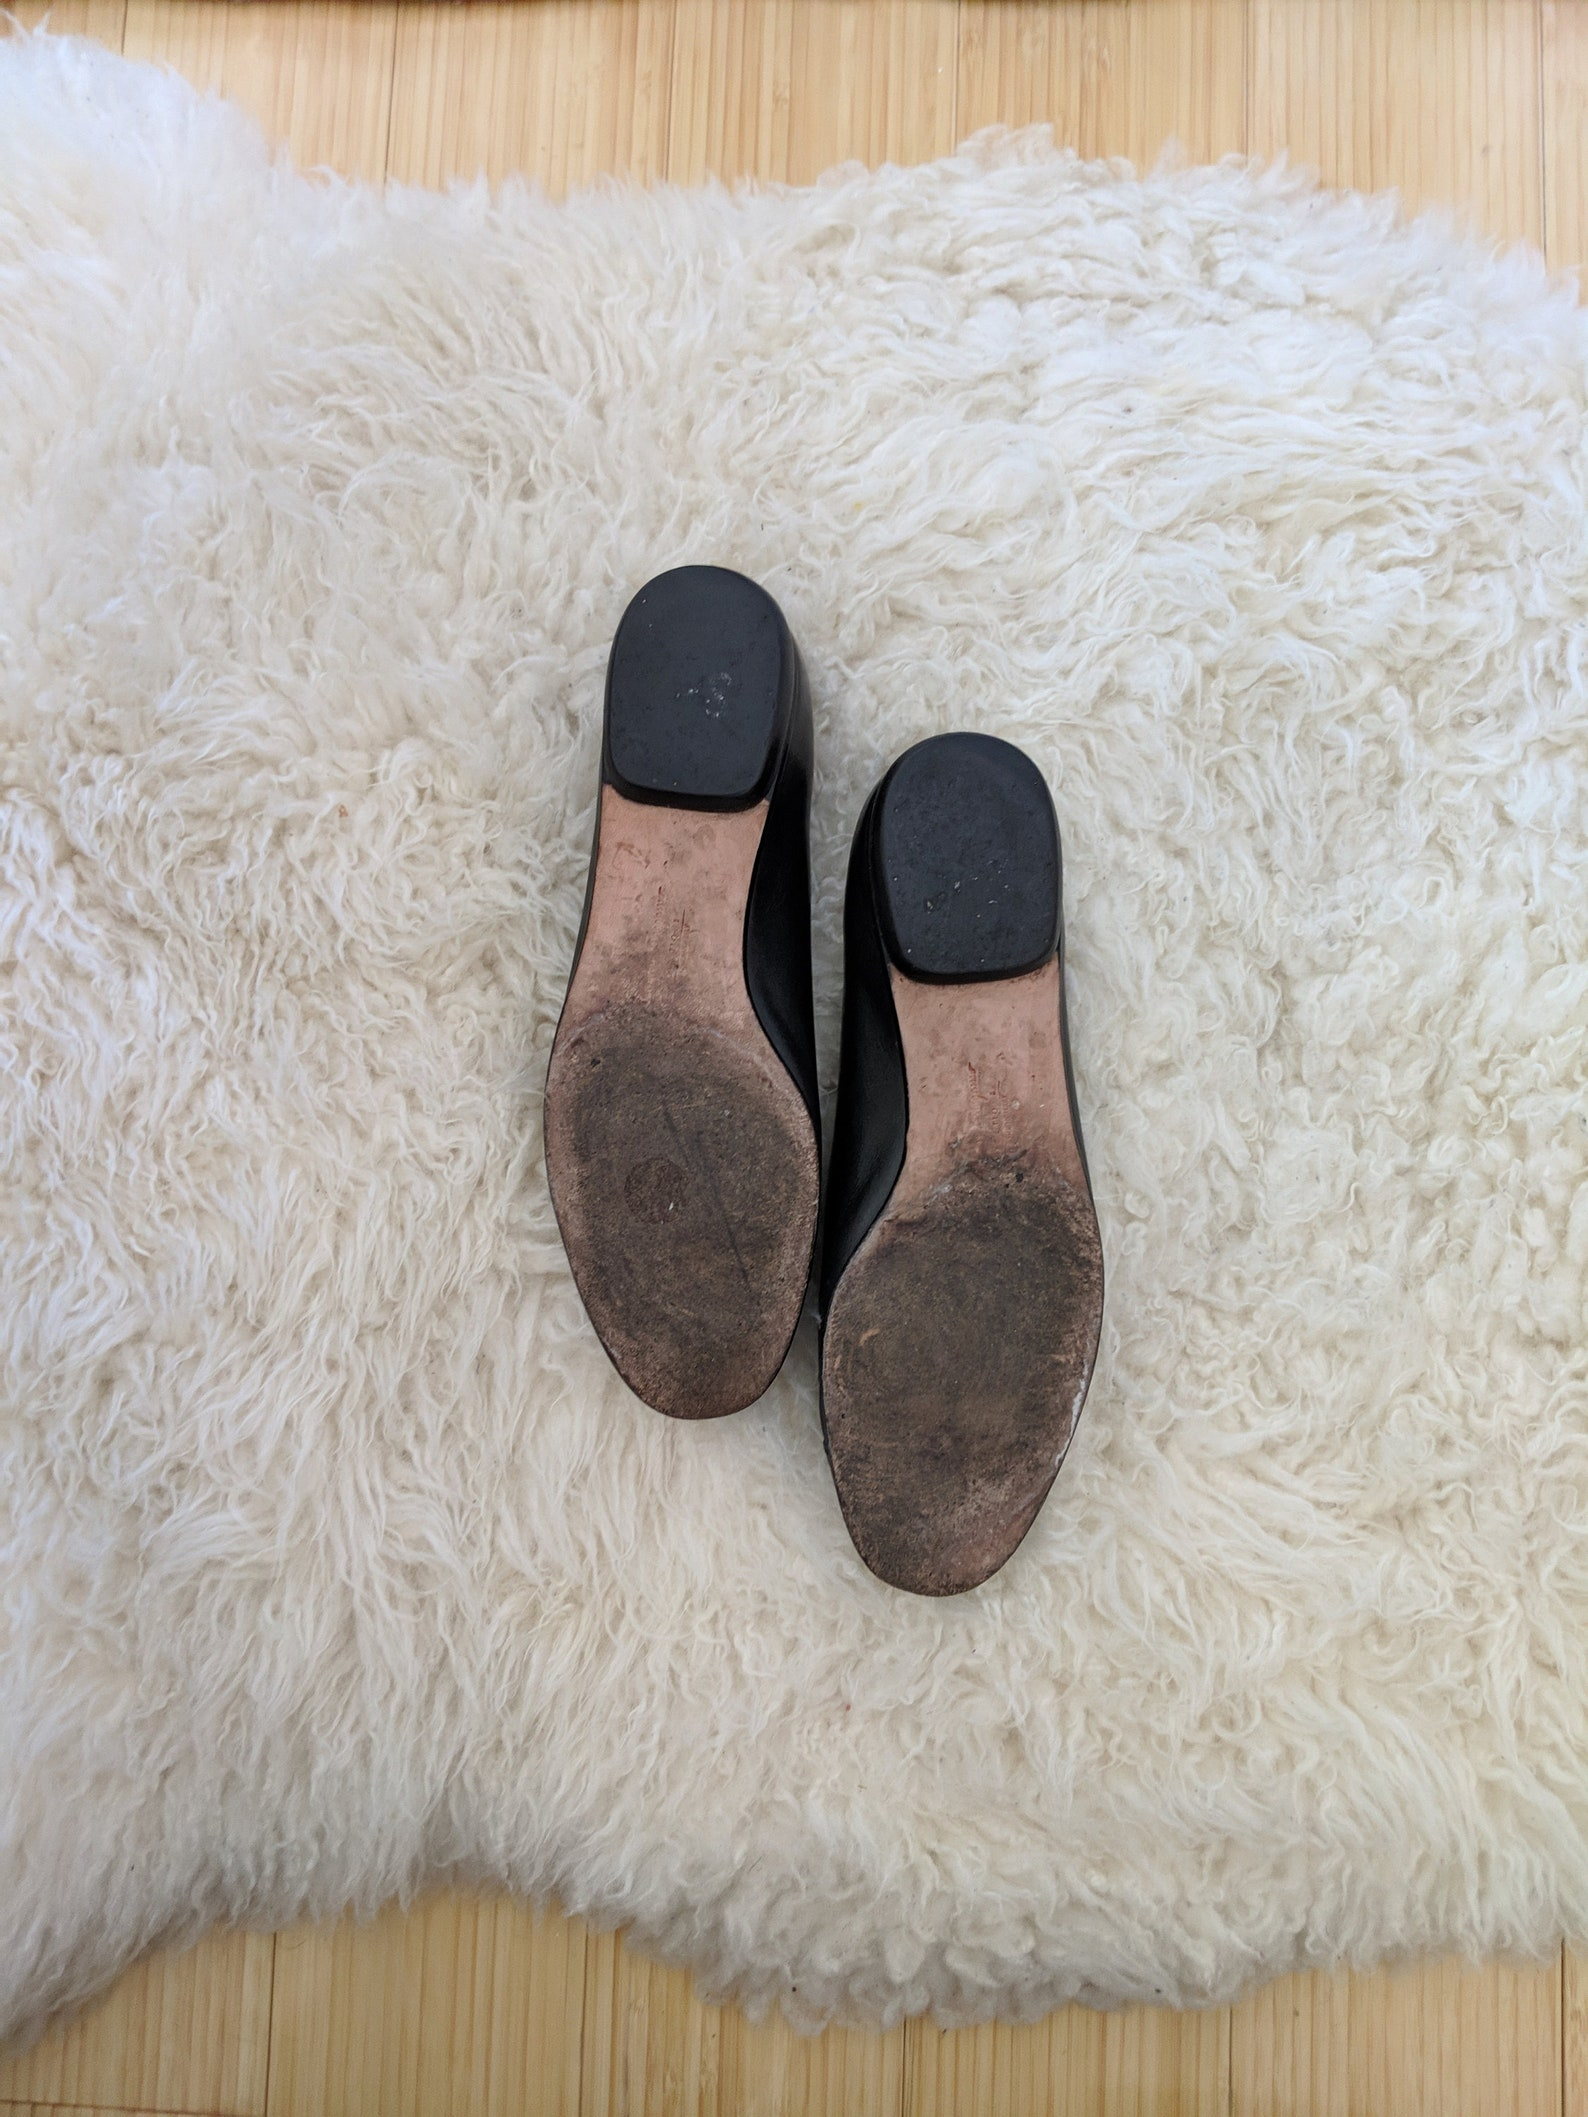 vtg salvatore ferragamo black cap toe pump, 6.5 b // ferragamo italian leather shoes // classic ballet flat // snakeskin cap toe